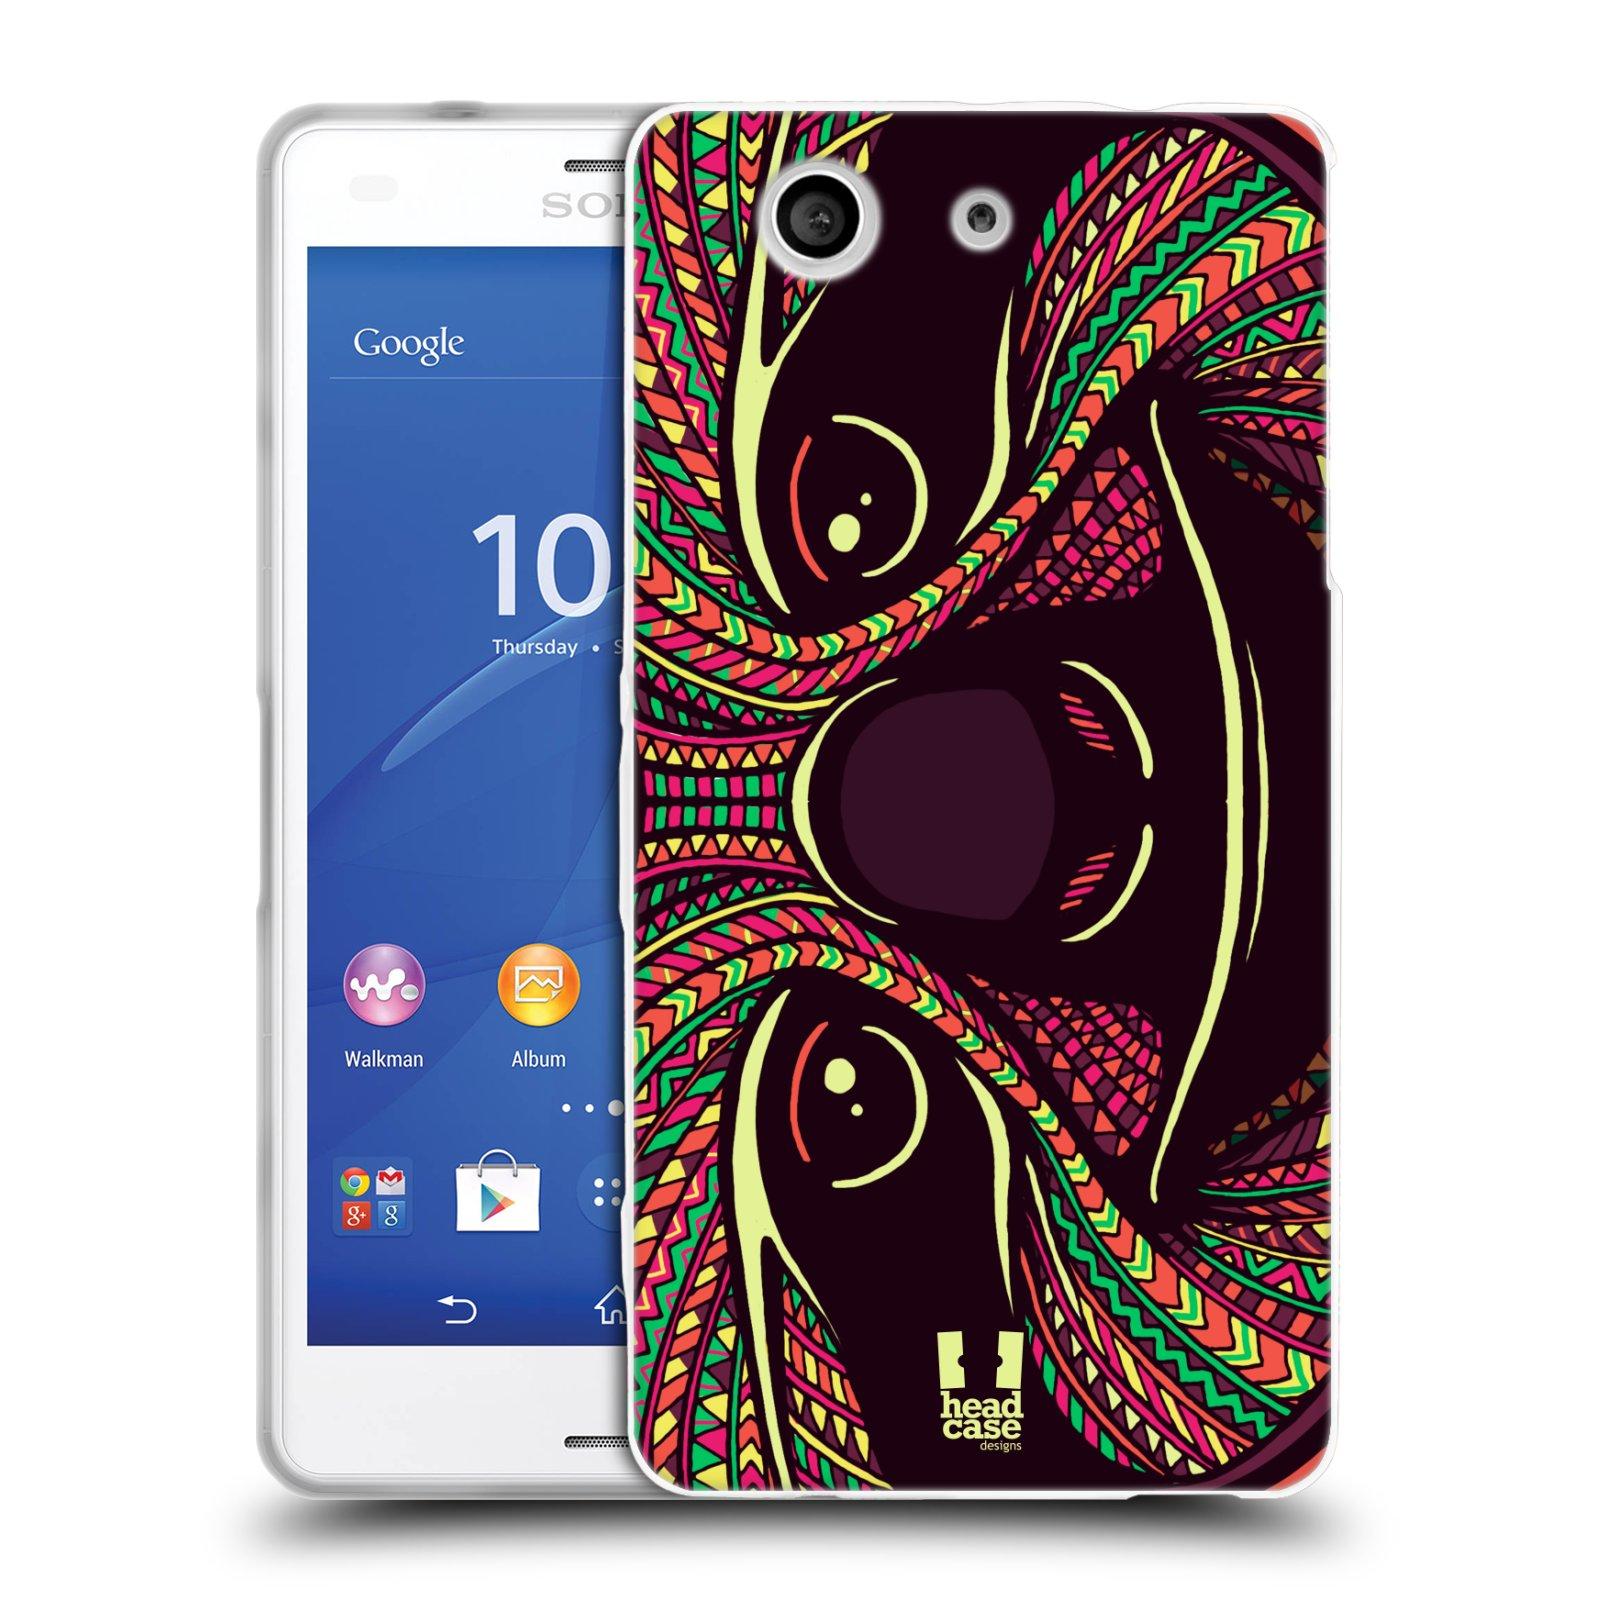 Silikonové pouzdro na mobil Sony Xperia Z3 Compact D5803 HEAD CASE AZTEC LENOCHOD